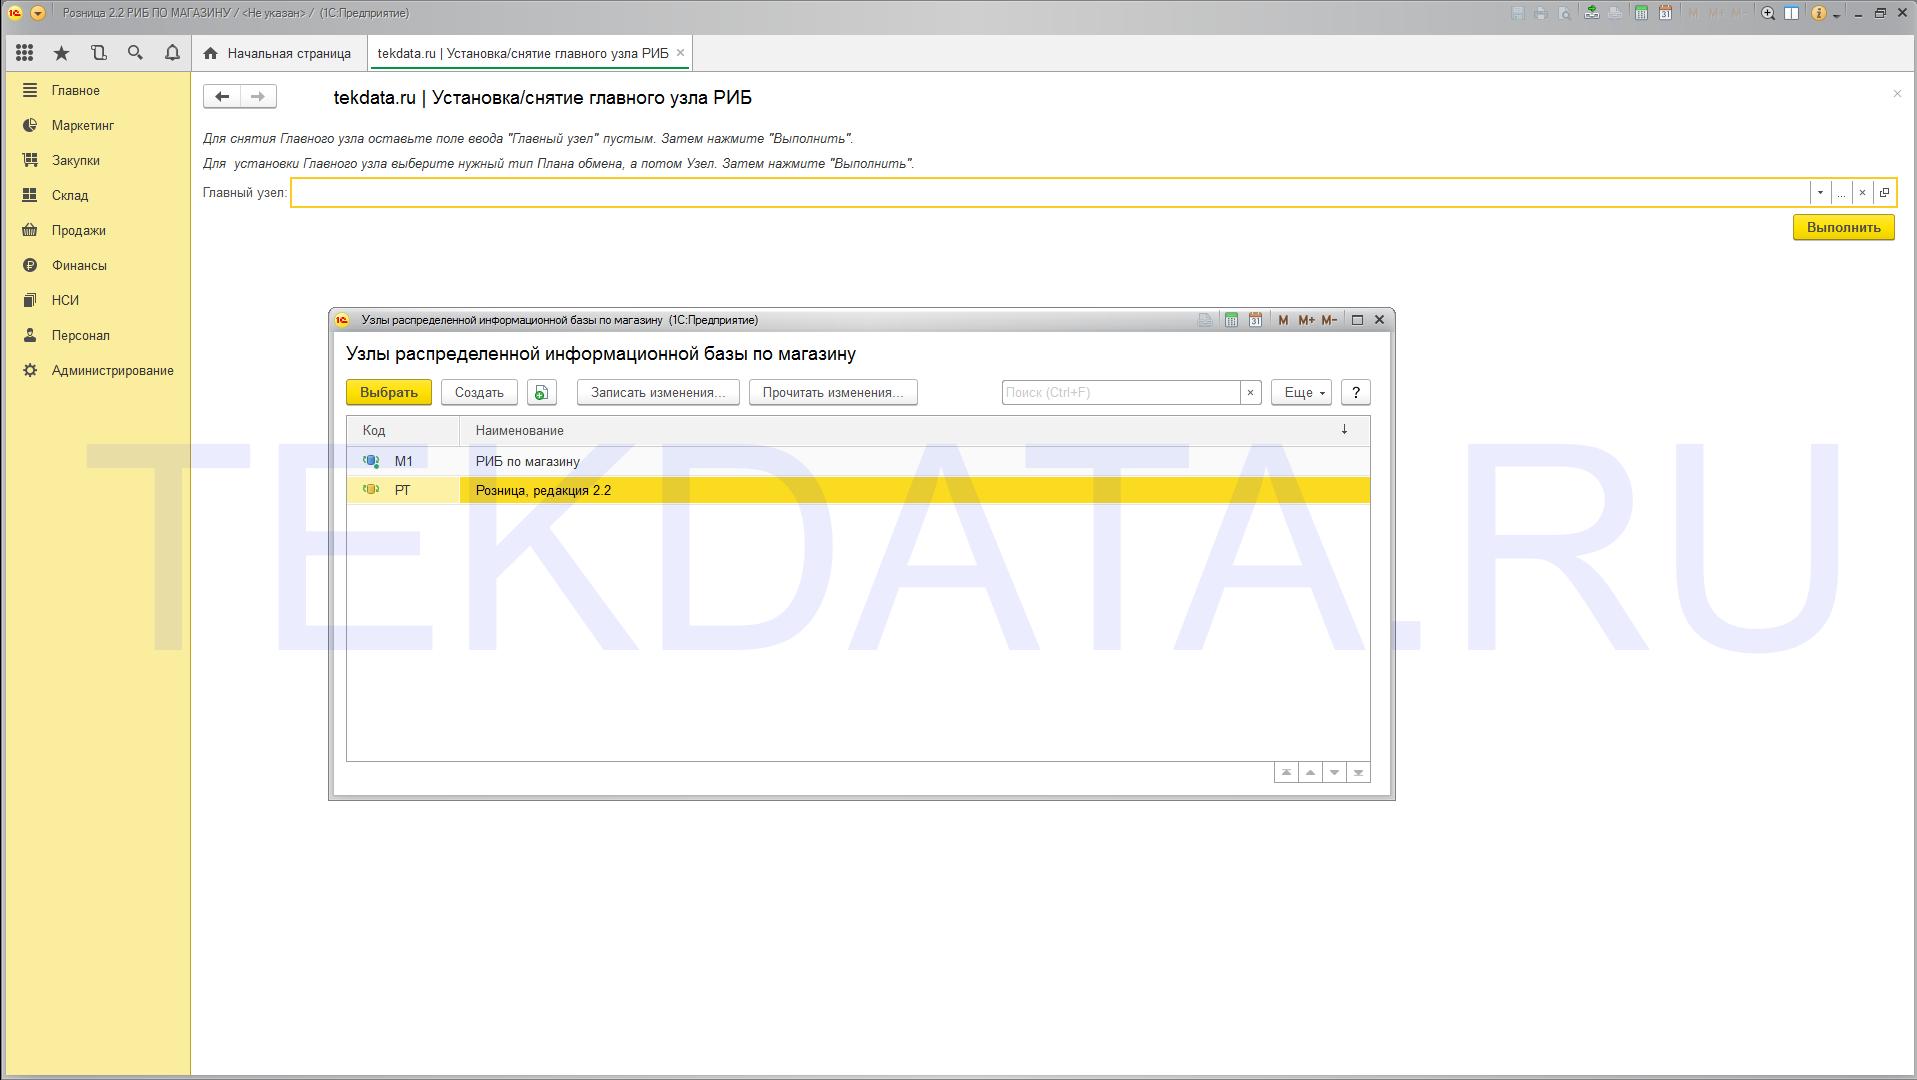 Установка и снятие главного узла РИБ для 1С:Предприятие 8.2 и 8.3 (внешняя обработка *.epf) | tekdata.ru